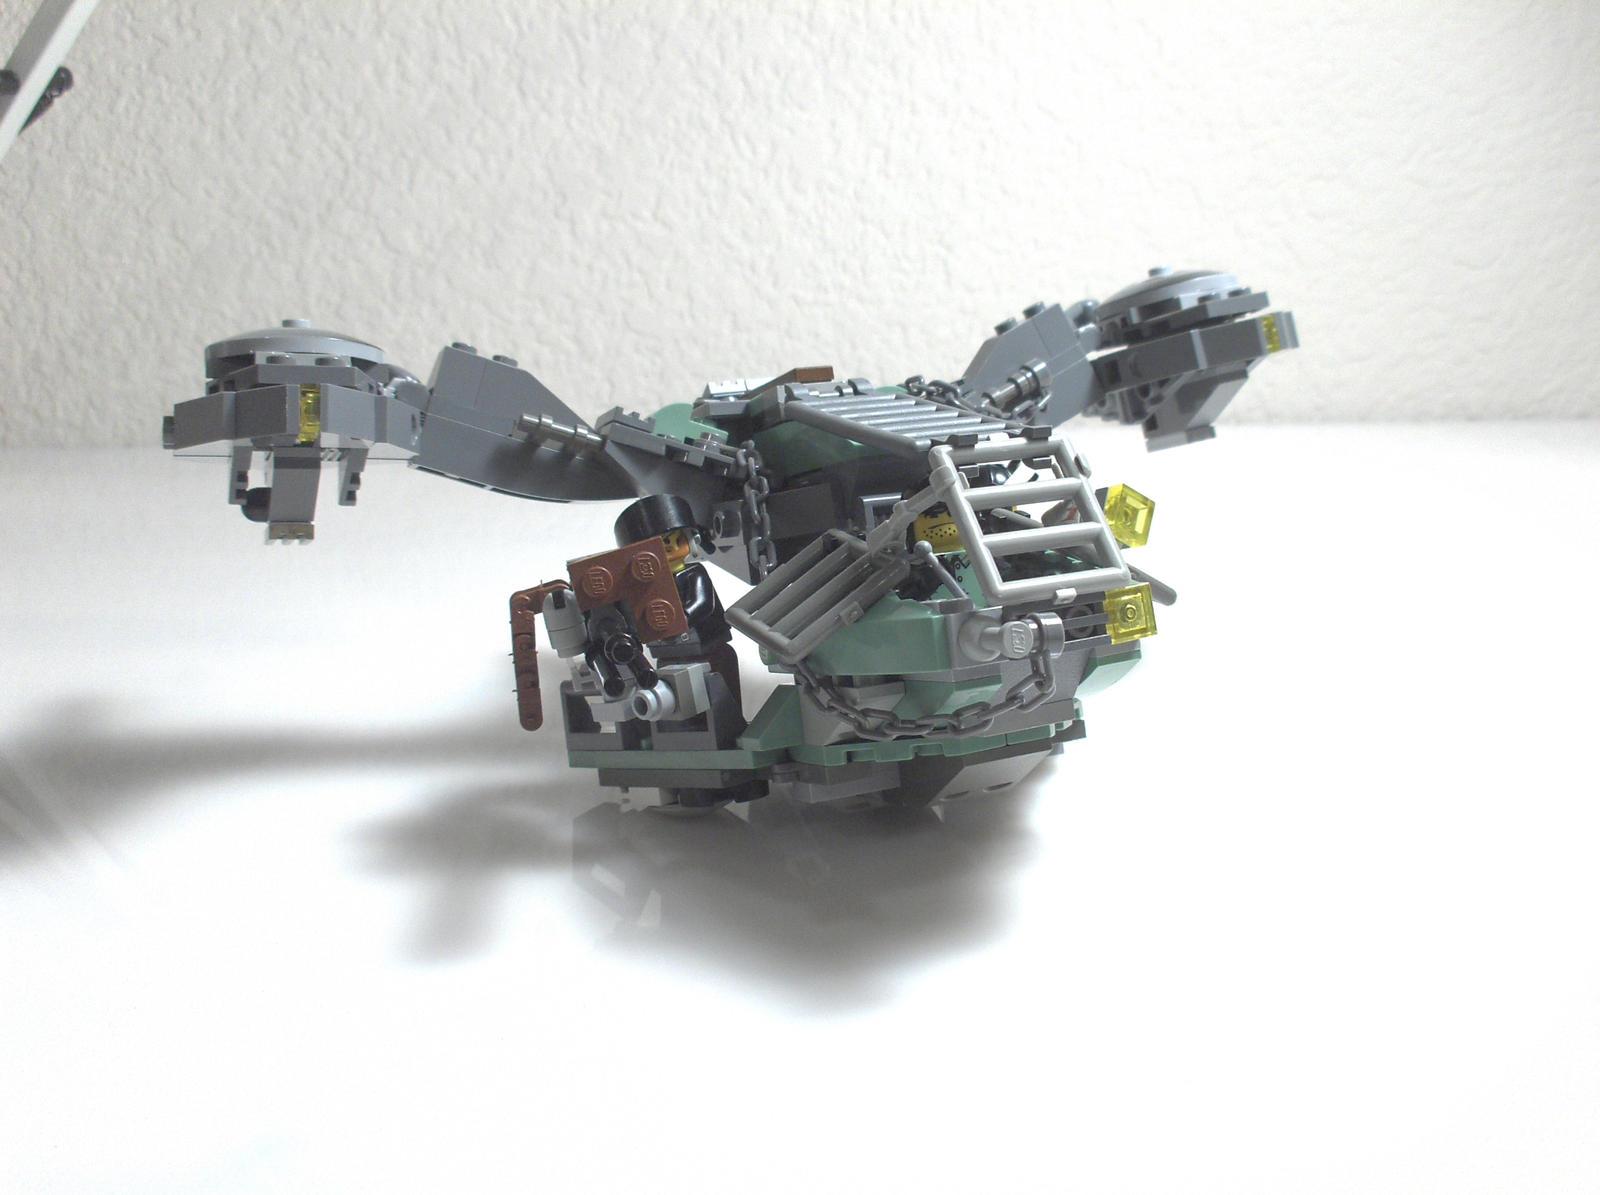 Post-Apoc Hornet 1 by Tekka-Croe